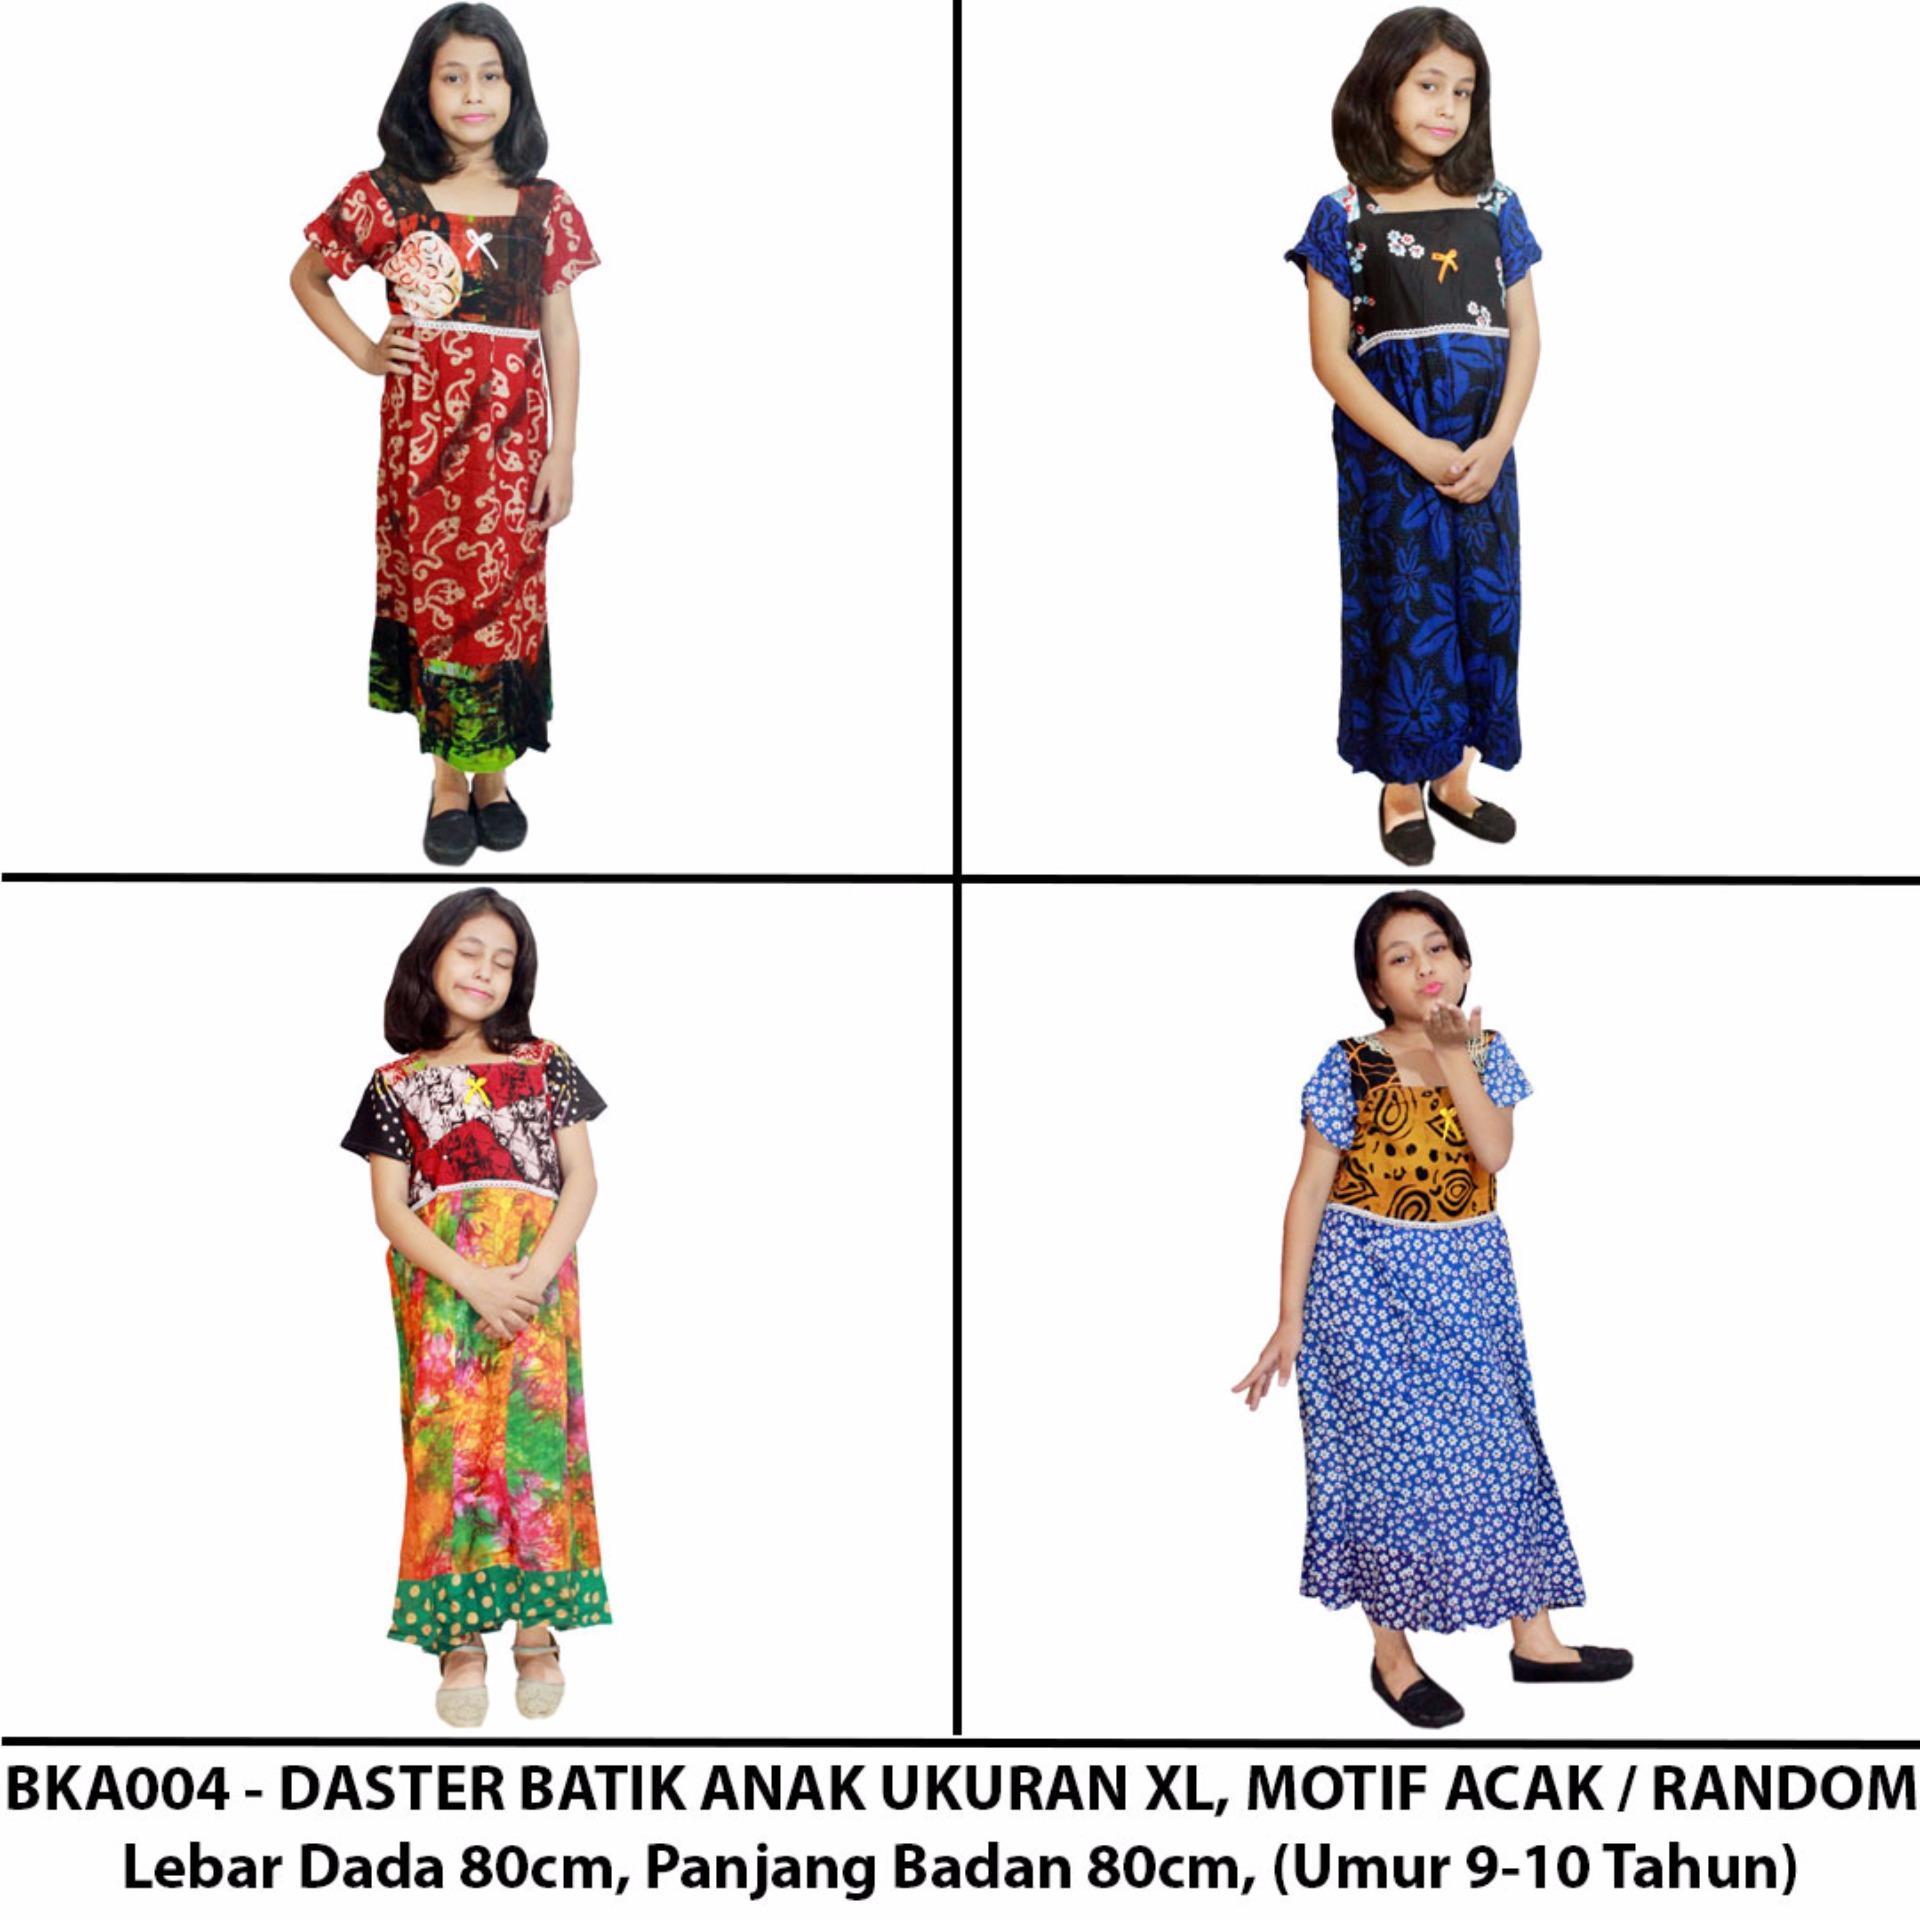 Daster Anak Batik, Baju Tidur Anak, Piyama Anak, Ukuran XL Usia 9-10 Tahun (BKA004)